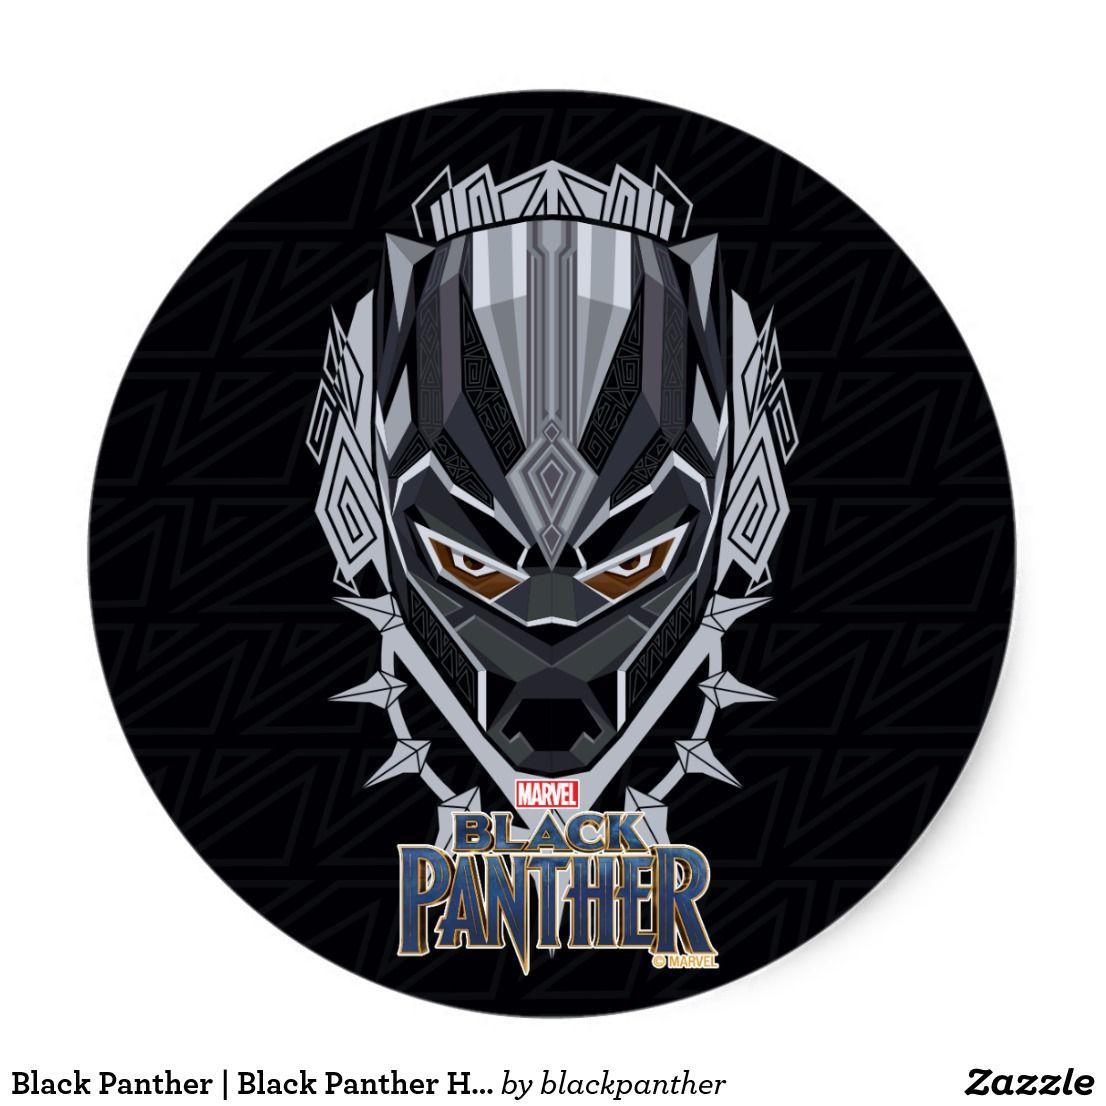 Black panther black panther head emblem blackpanther marvel comics marvelcomics